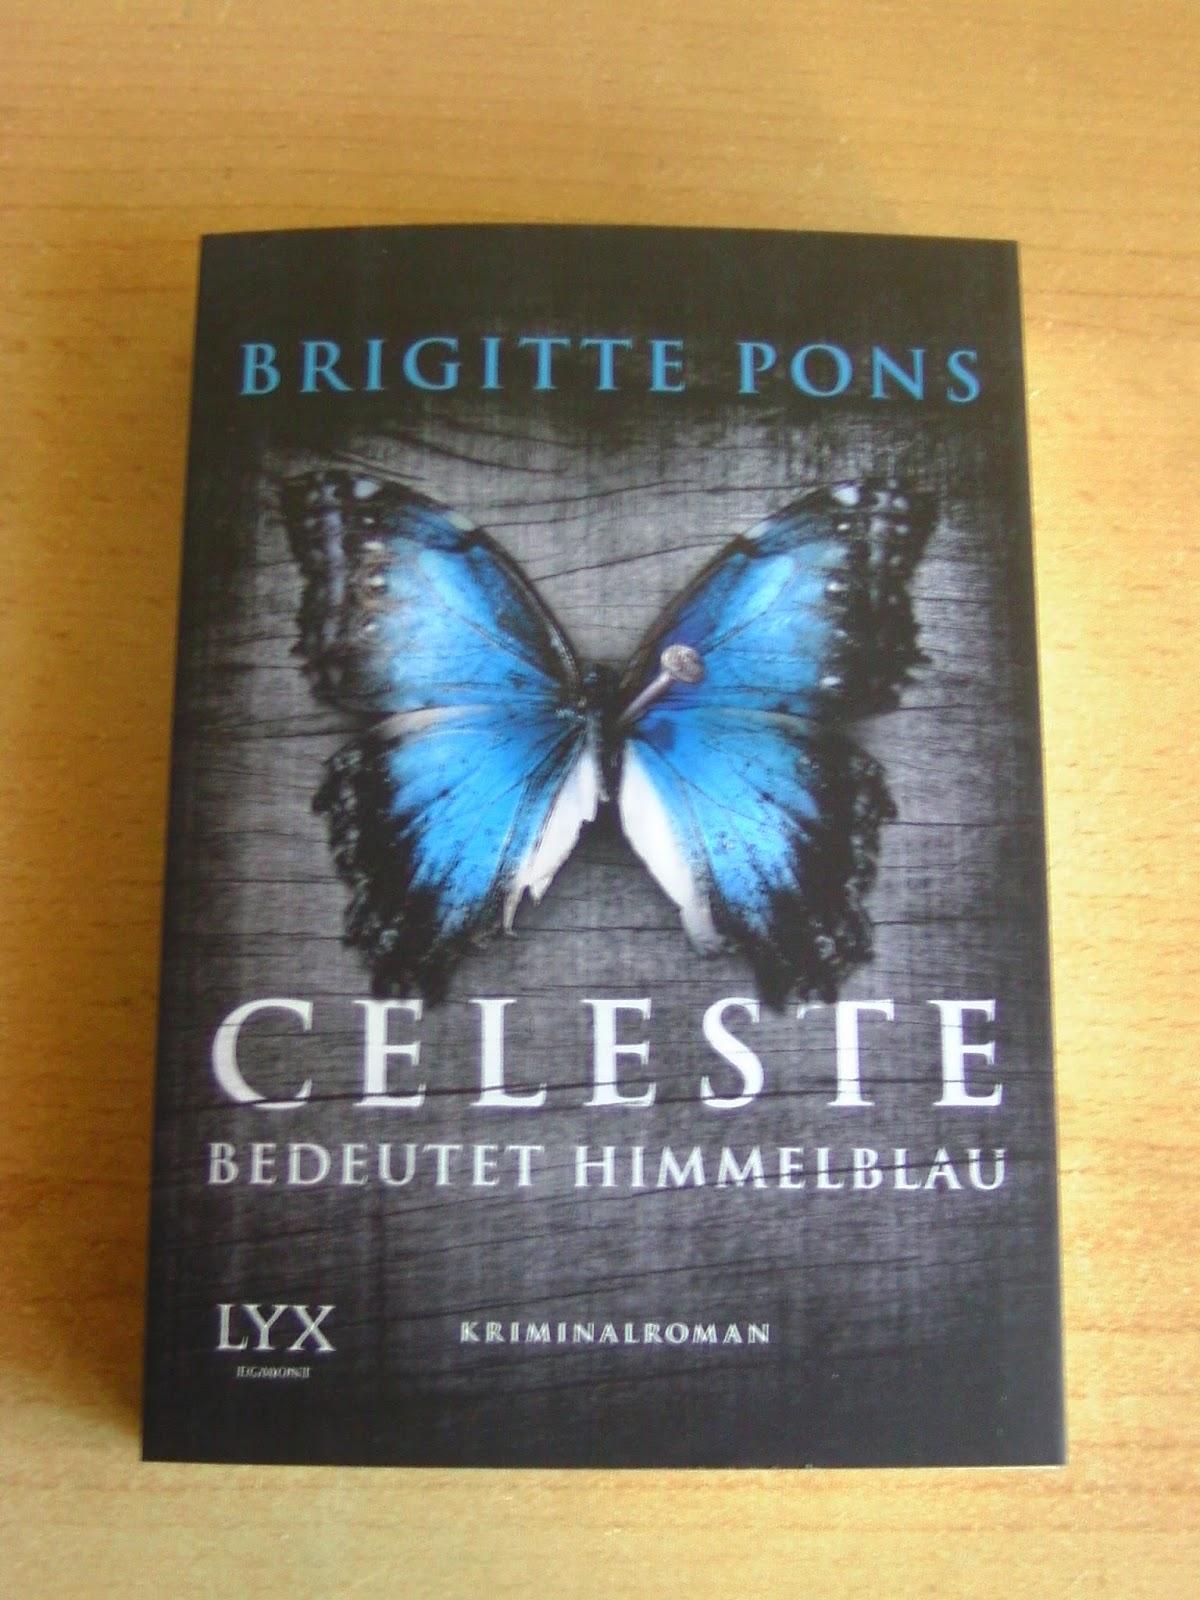 http://www.amazon.de/Celeste-bedeutet-Himmelblau-Liebknecht-ermittelt/dp/380259388X/ref=sr_1_1?s=books&ie=UTF8&qid=1404118728&sr=1-1&keywords=celeste+bedeutet+himmelblau